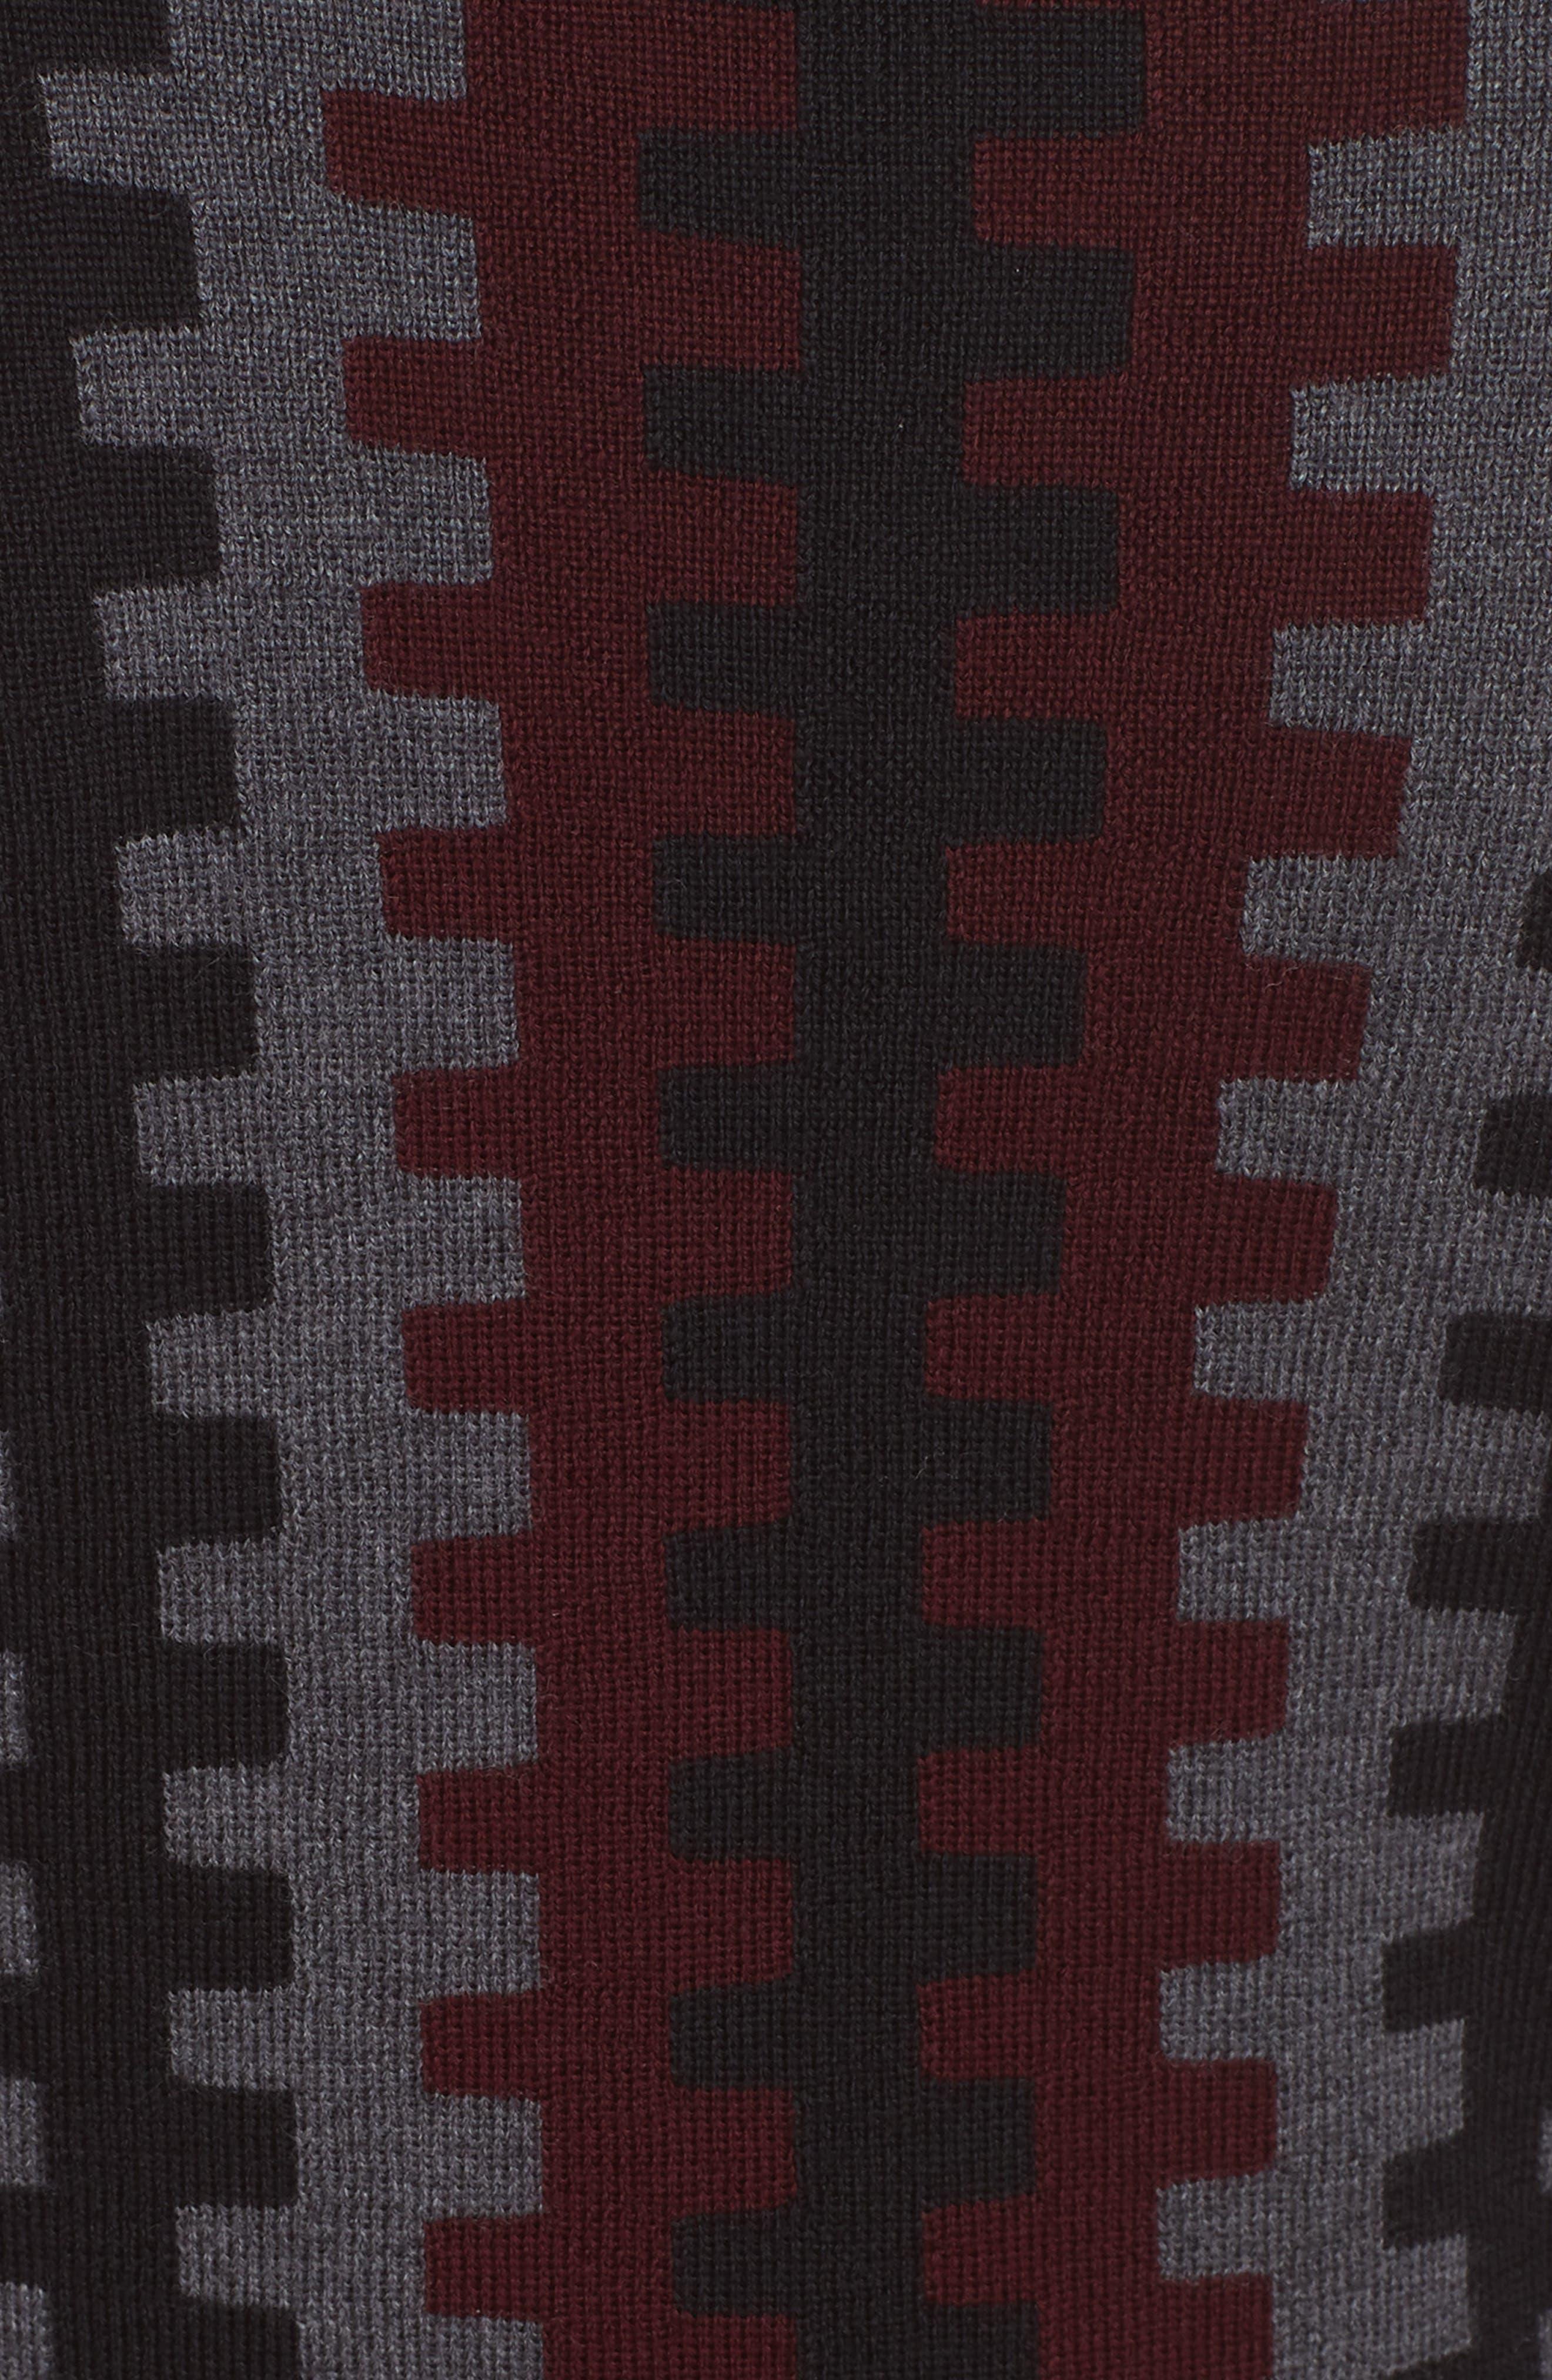 Diane von Furstenberg Turtleneck Merino Wool Midi Dress,                             Alternate thumbnail 5, color,                             200